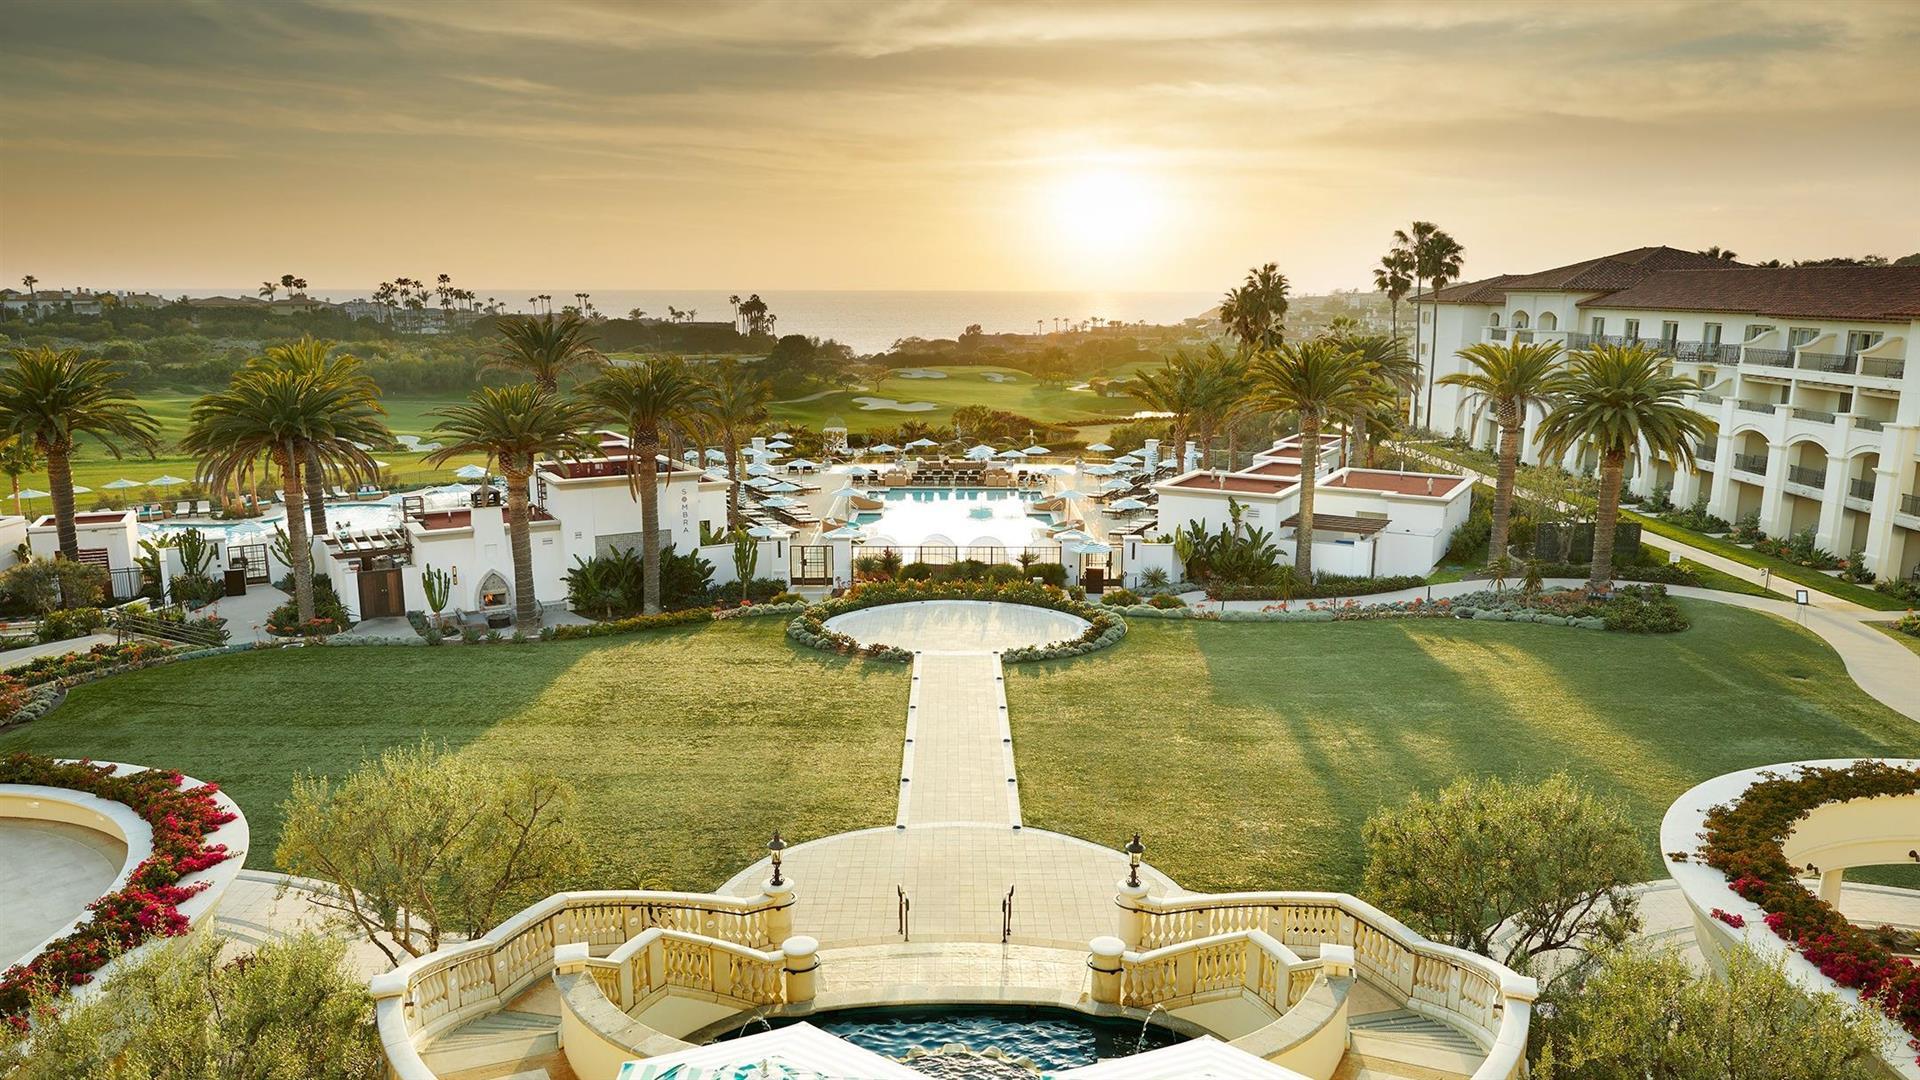 Meetings & Events at Monarch Beach Resort A KSL Resort Dana